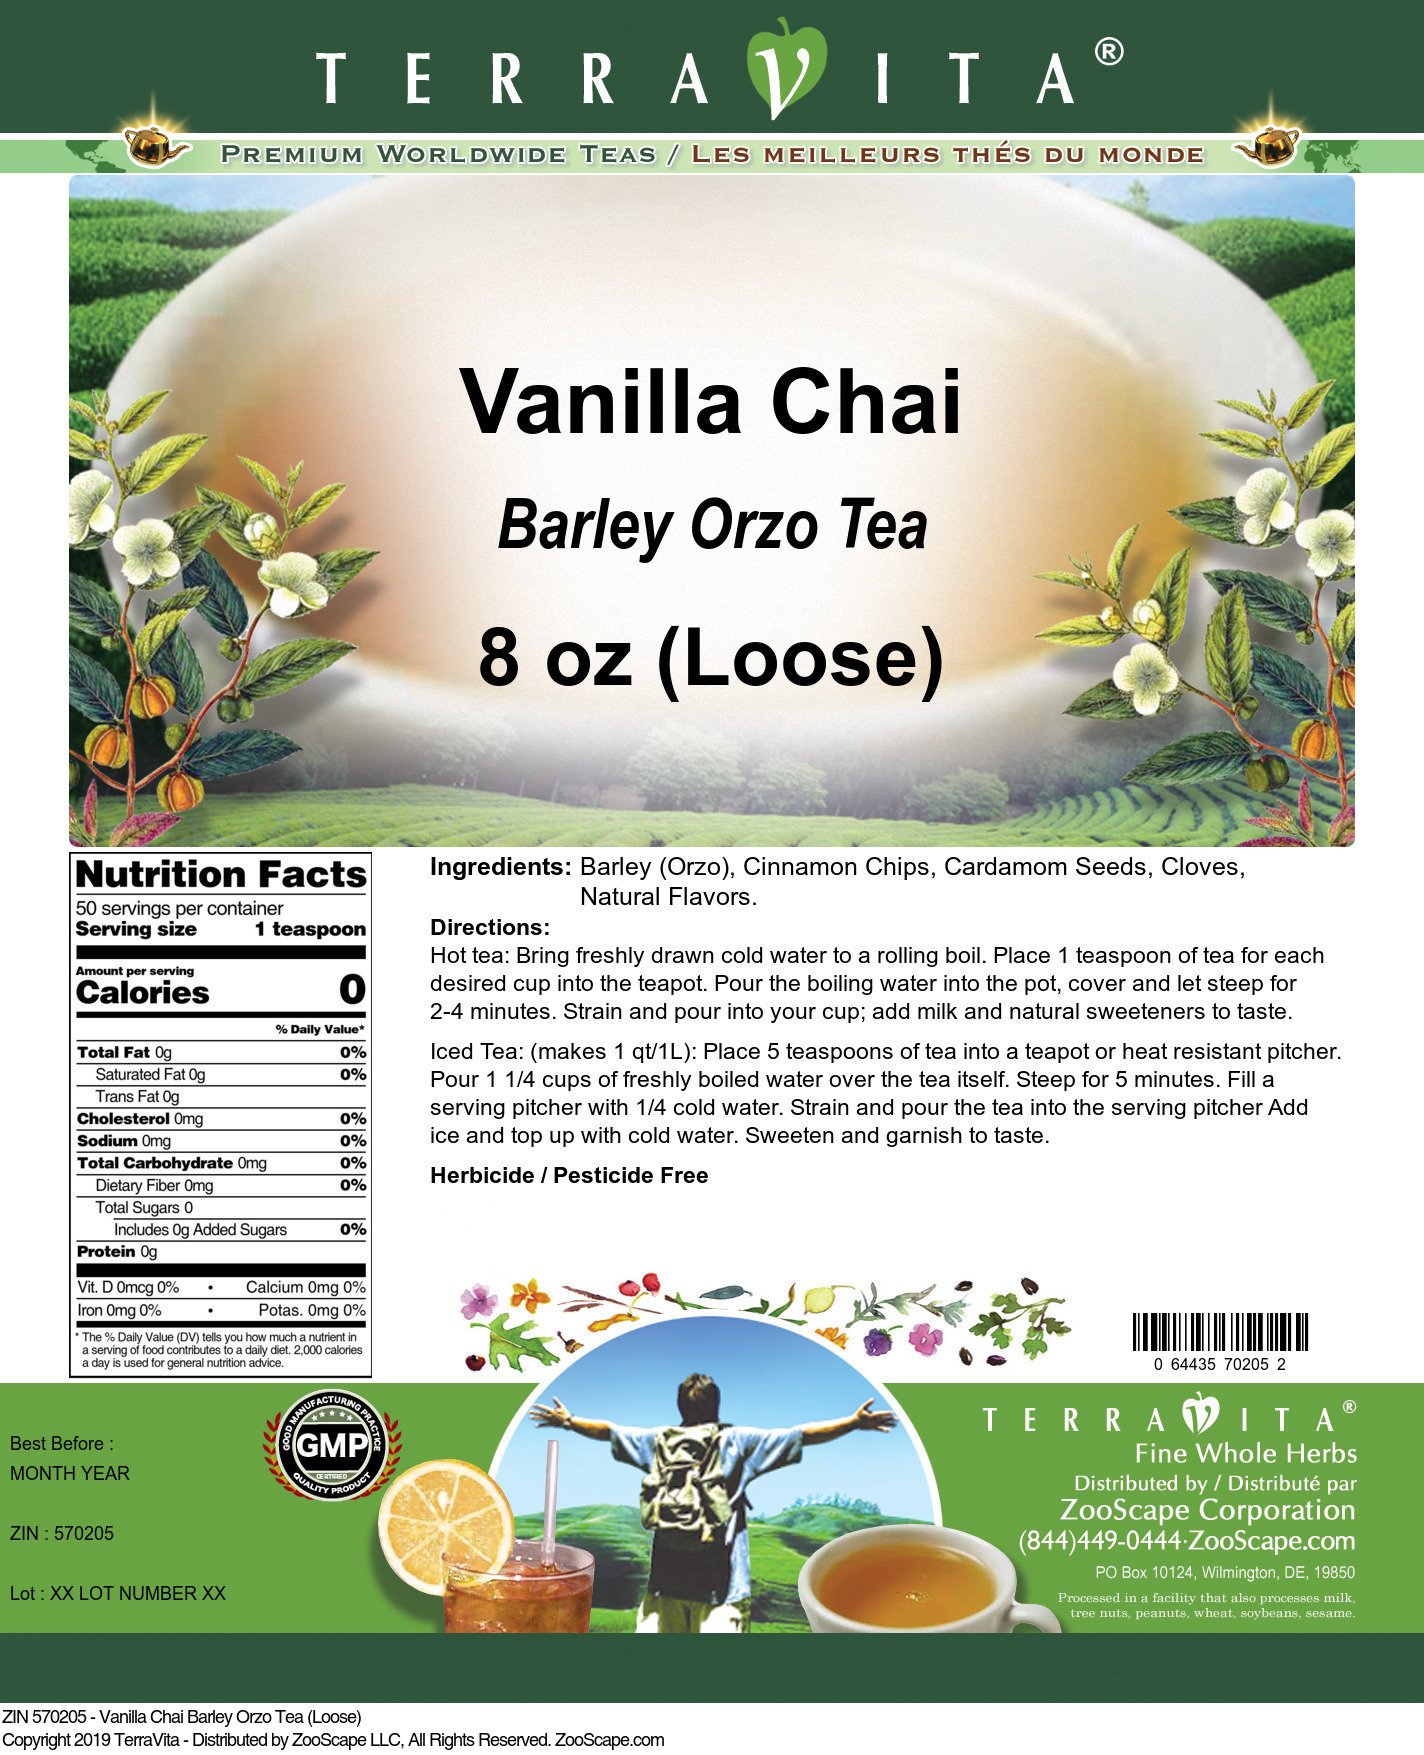 Vanilla Chai Barley Orzo Tea (Loose)